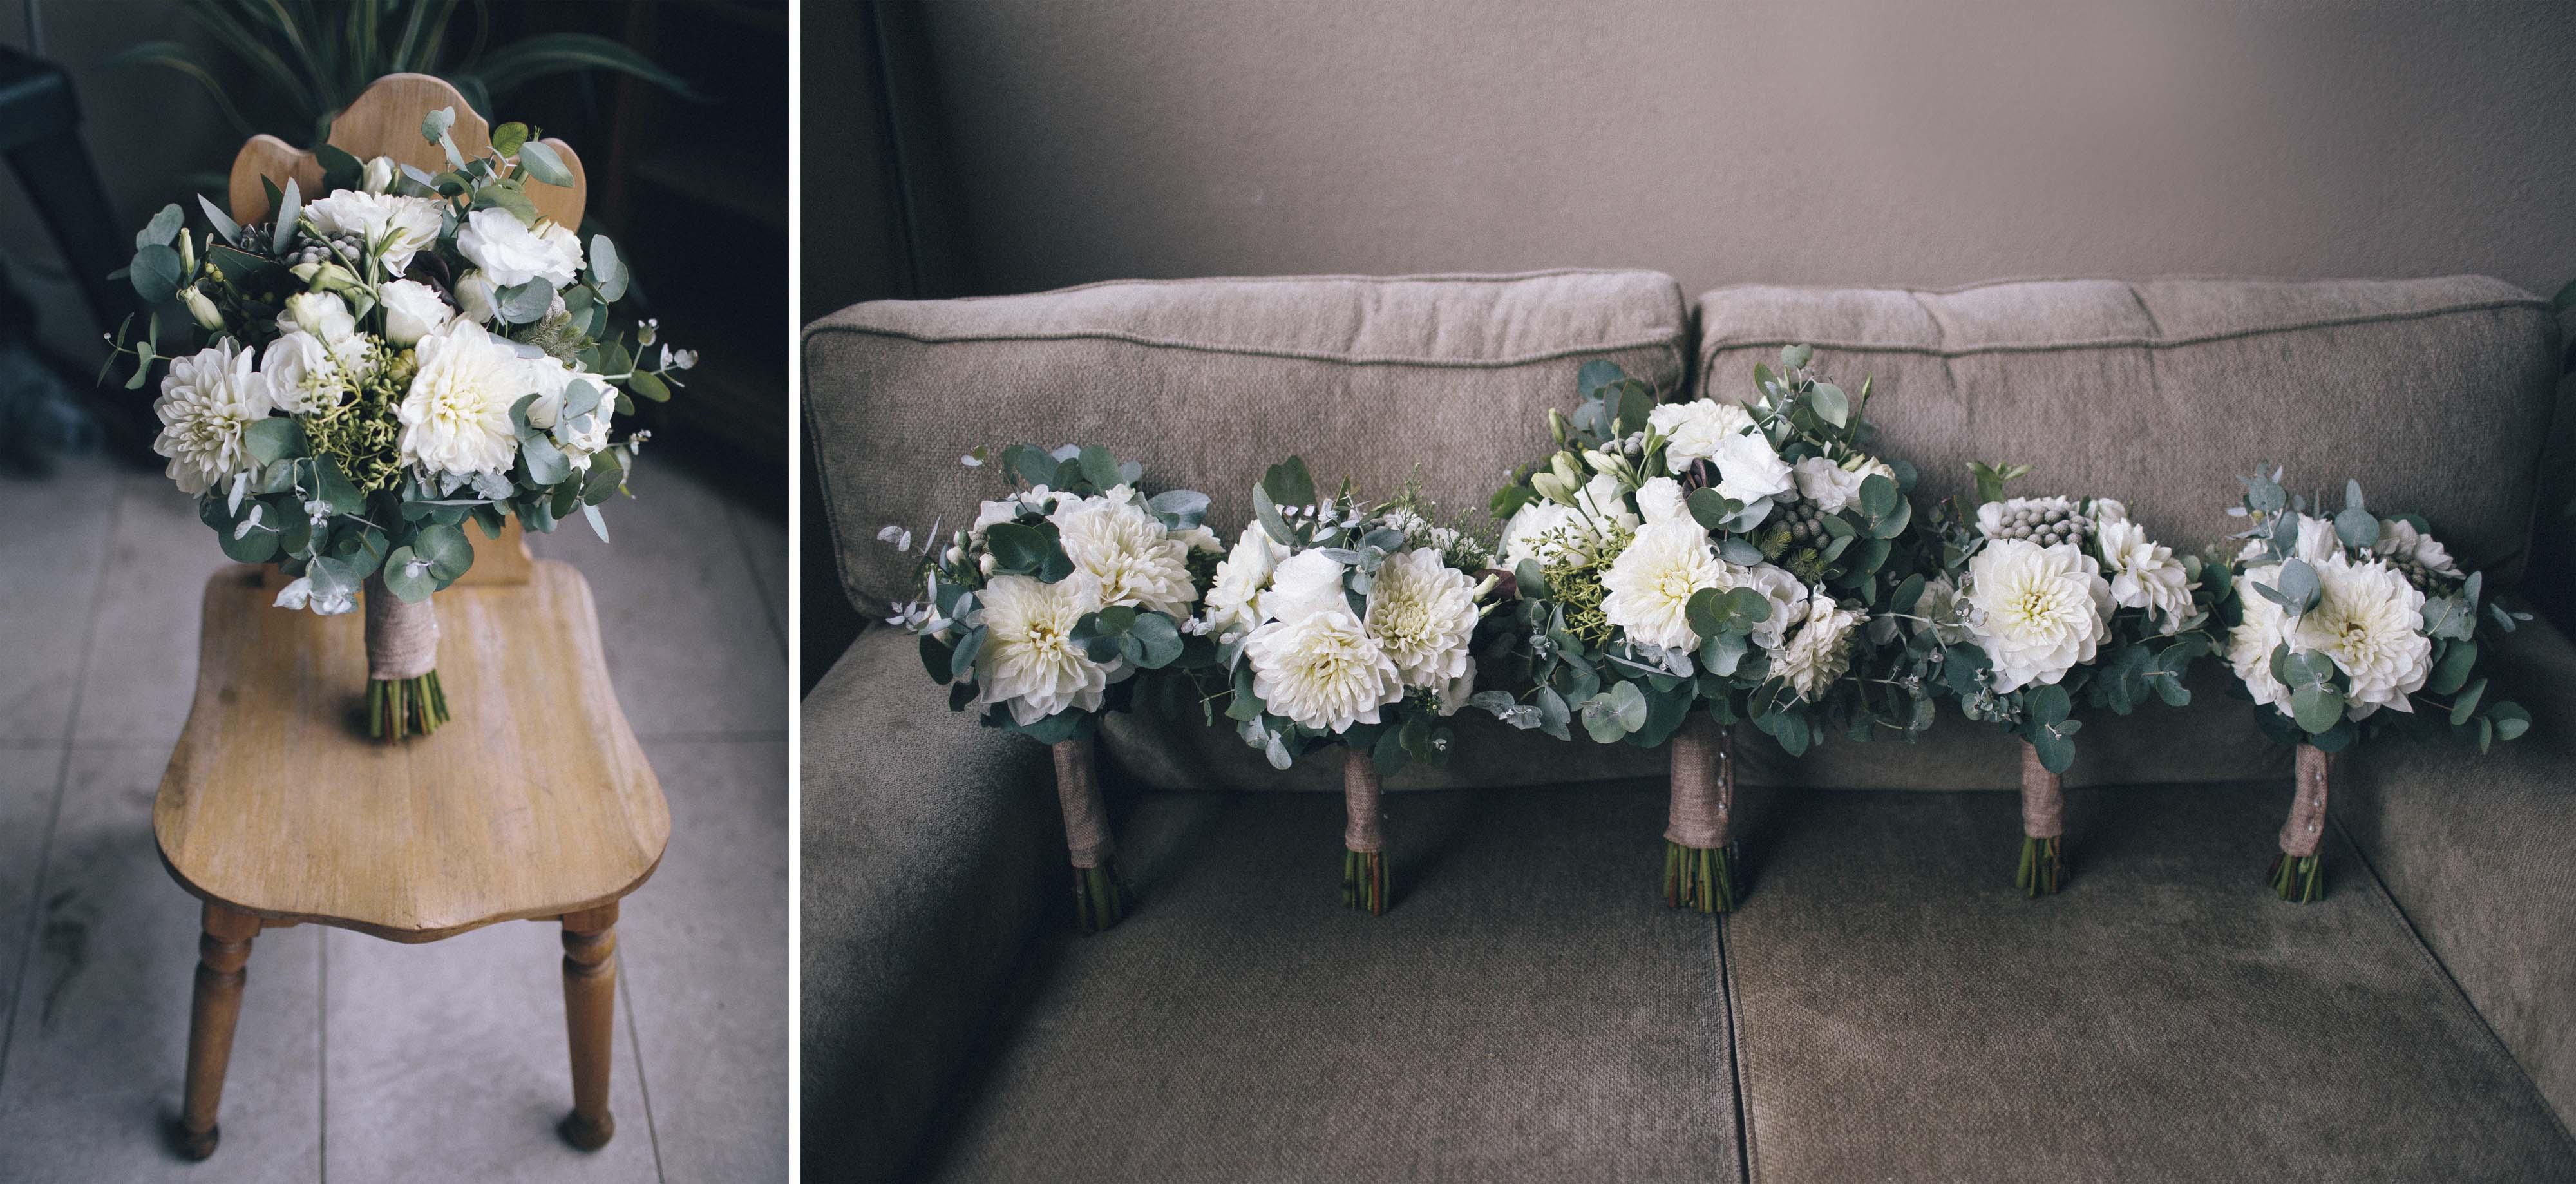 elise&liam-wedding-sonjacphotography-highres-143a